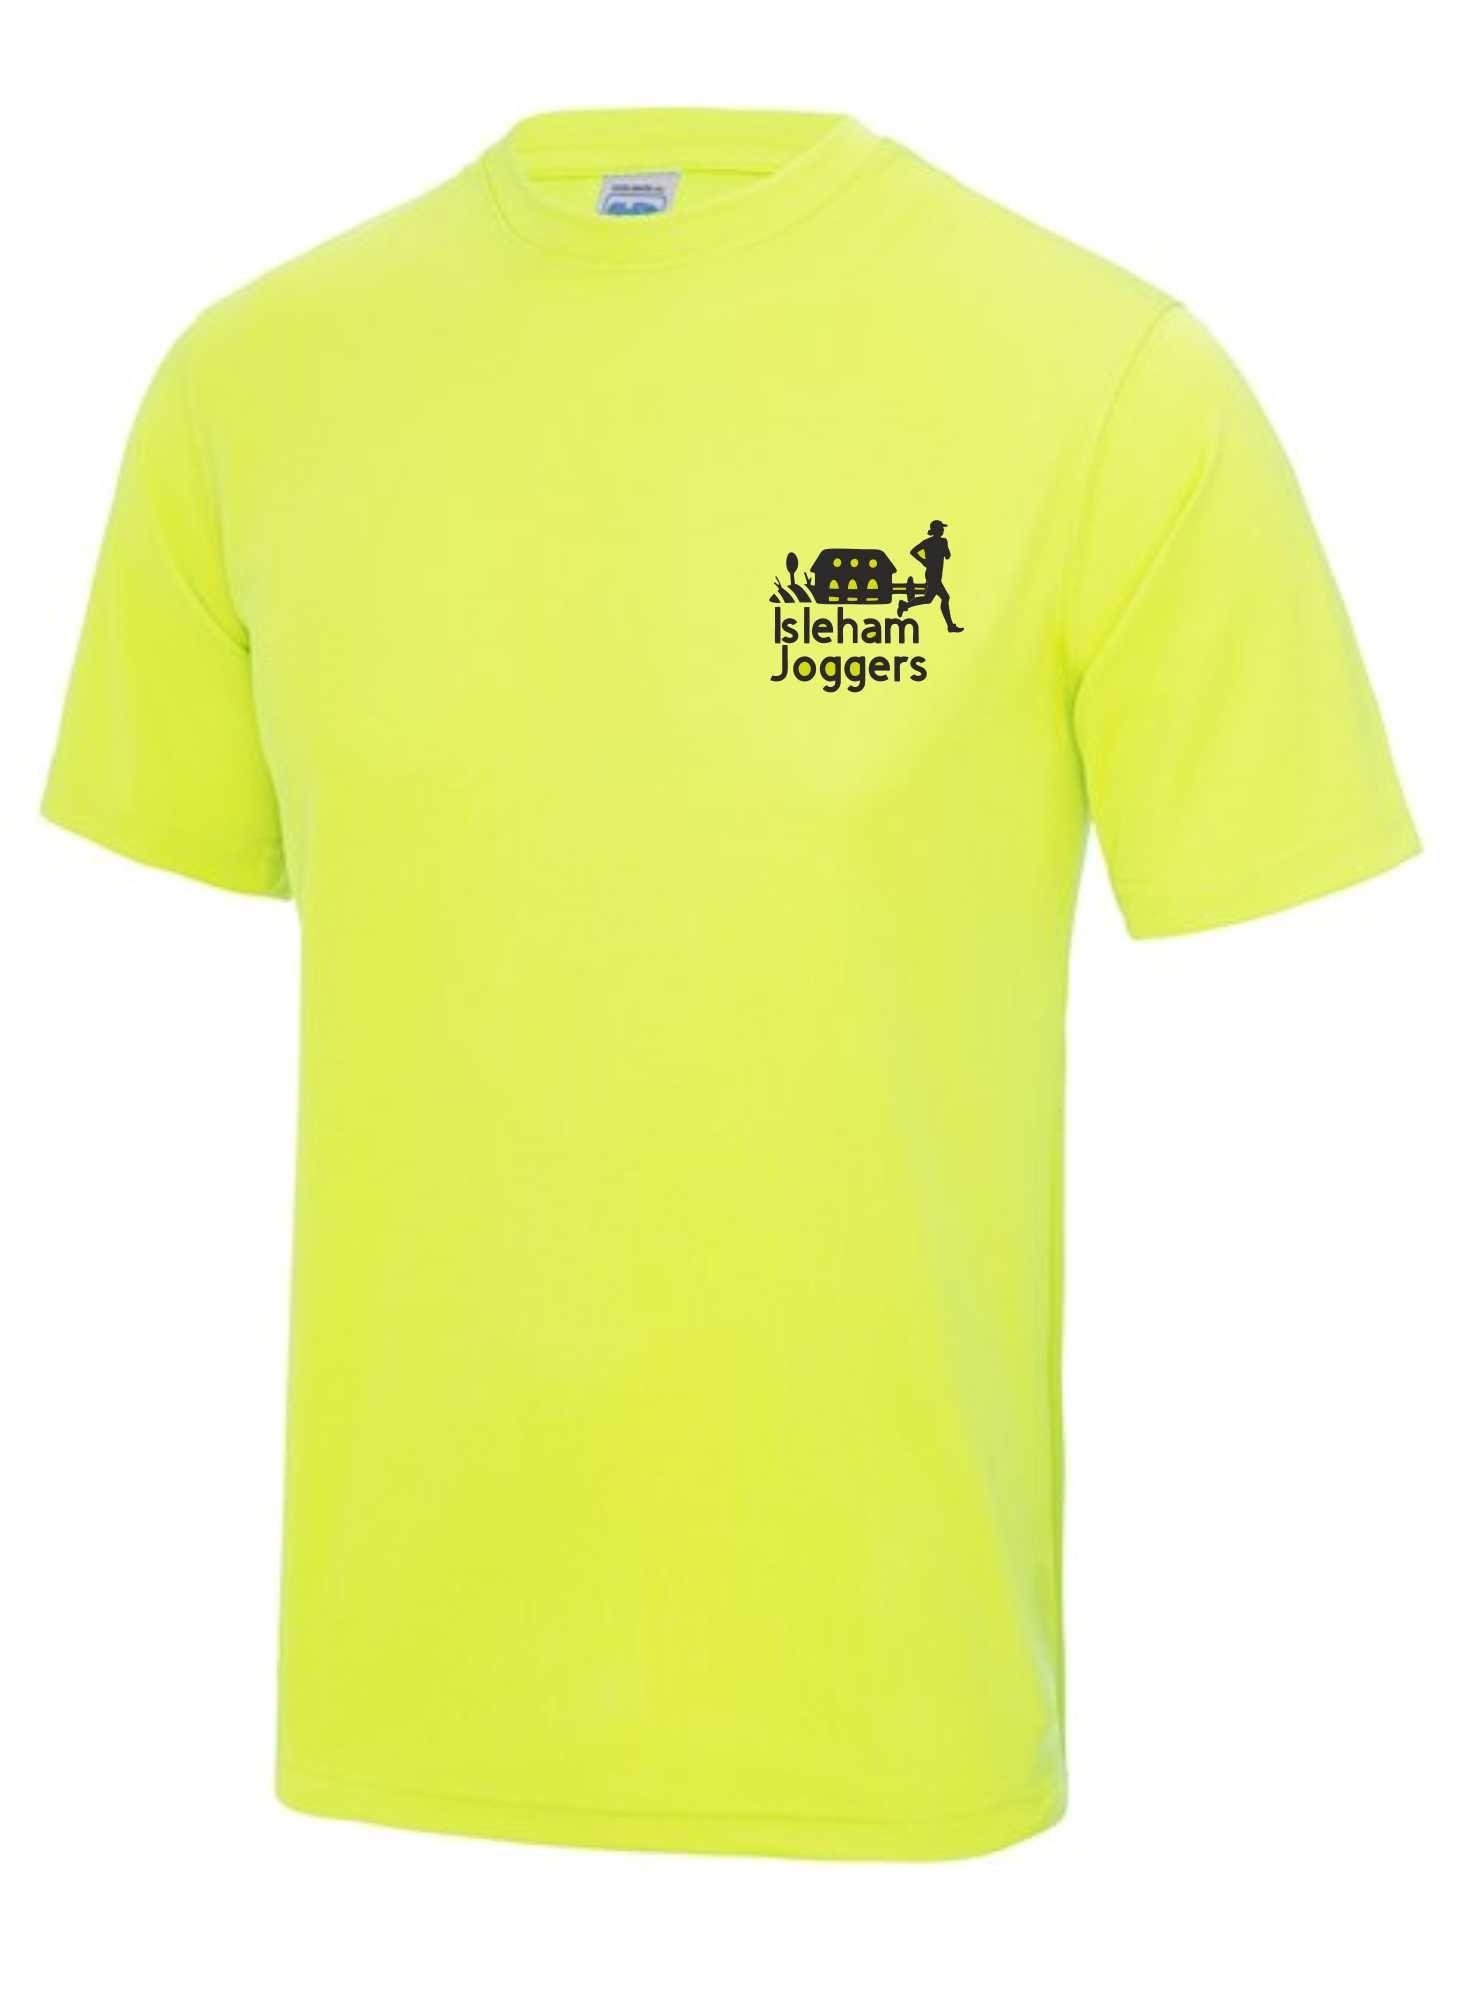 Isleham Joggers- Men's T-Shirt